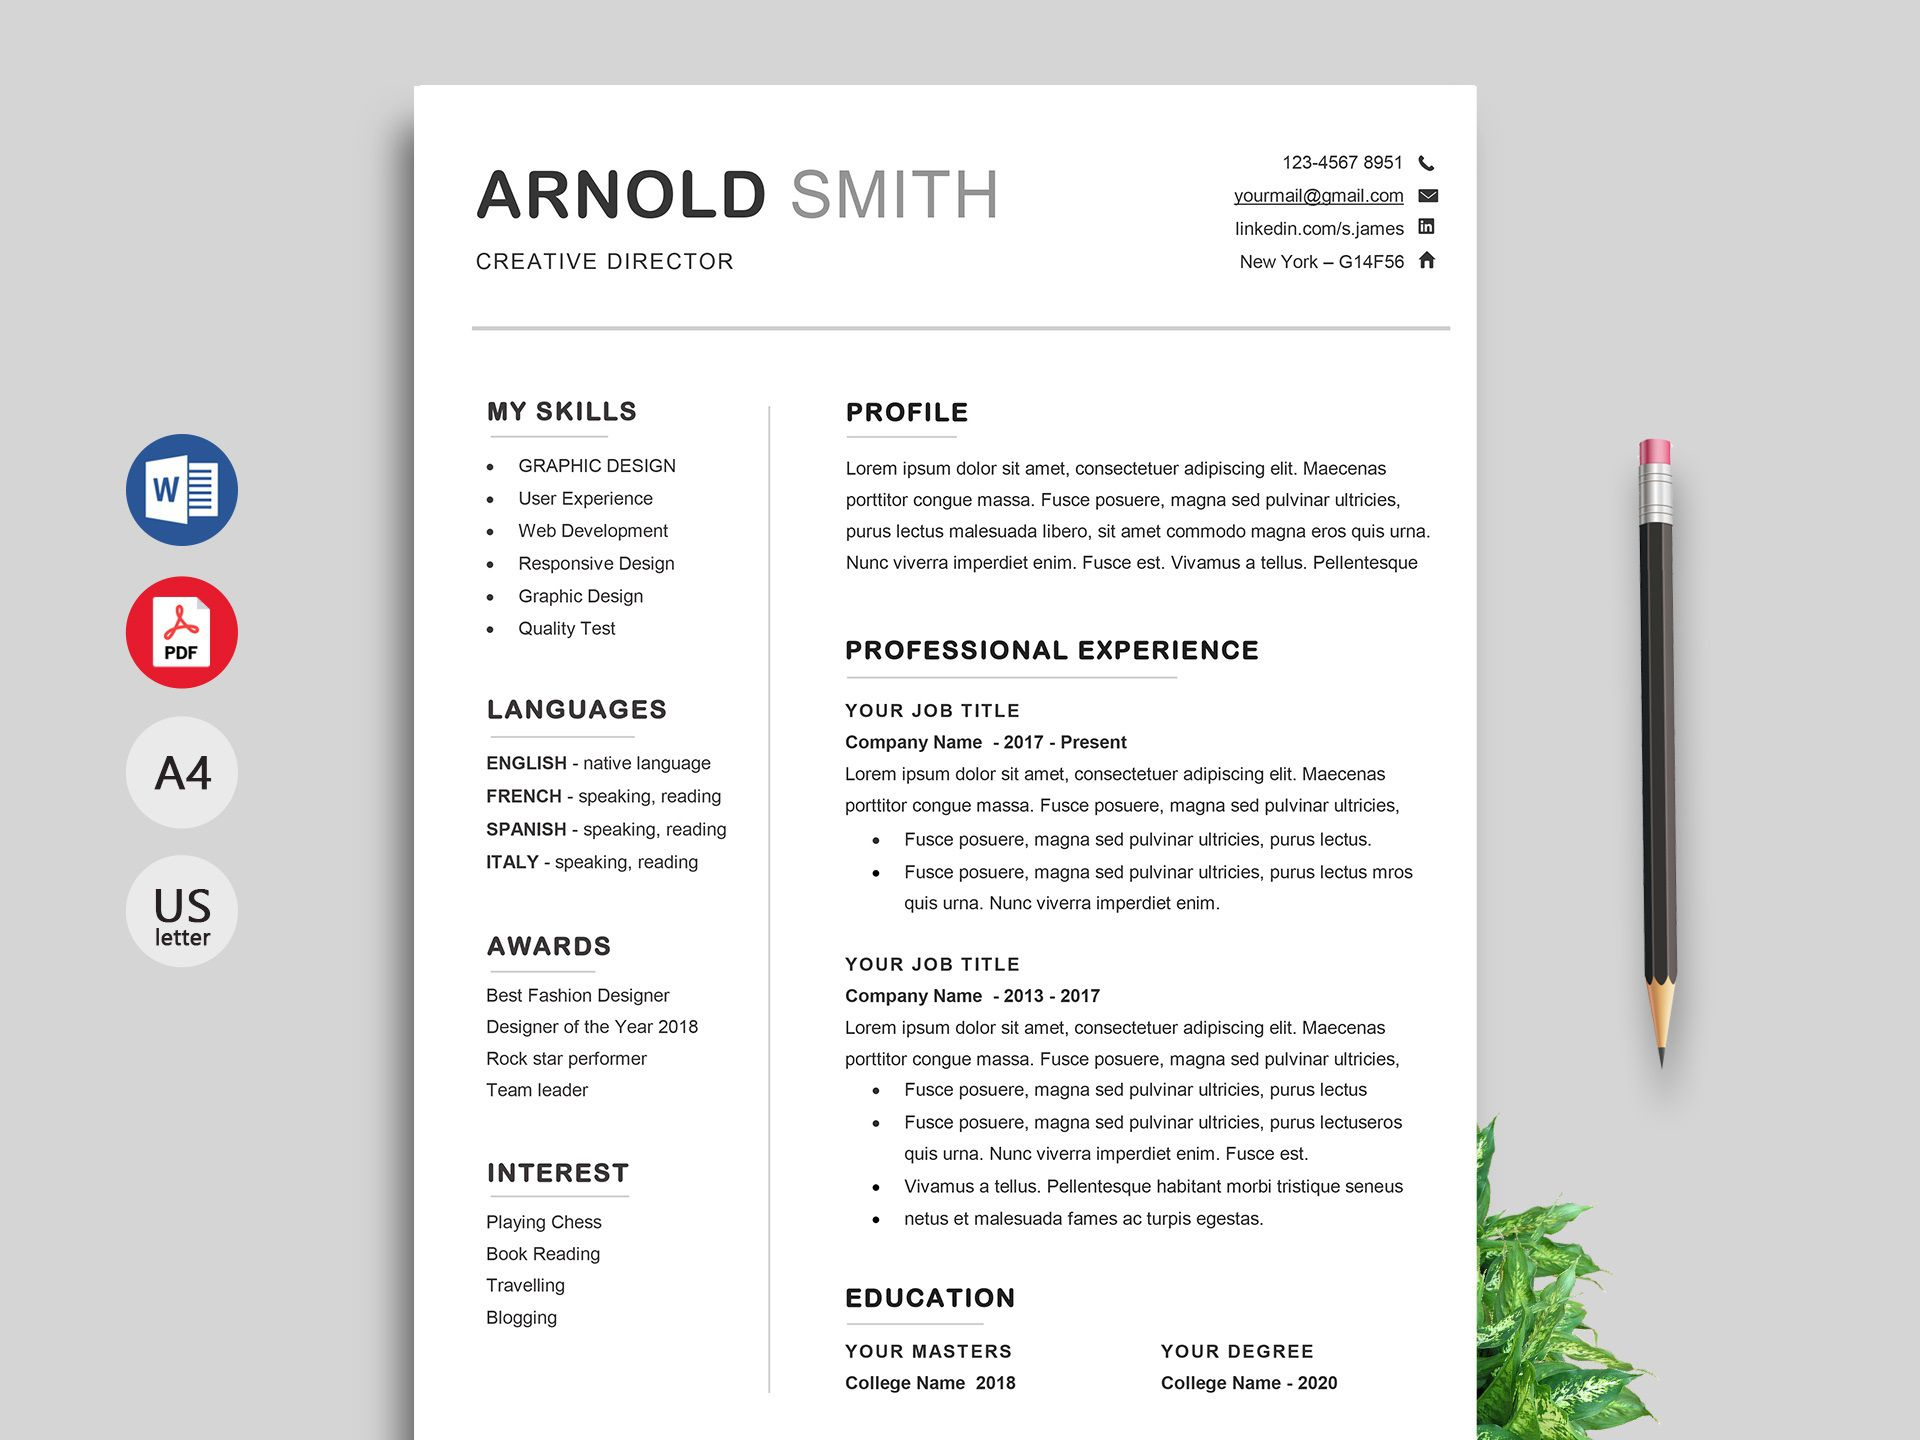 001 Best Professional Resume Template 2019 Free Download Idea  CvFull